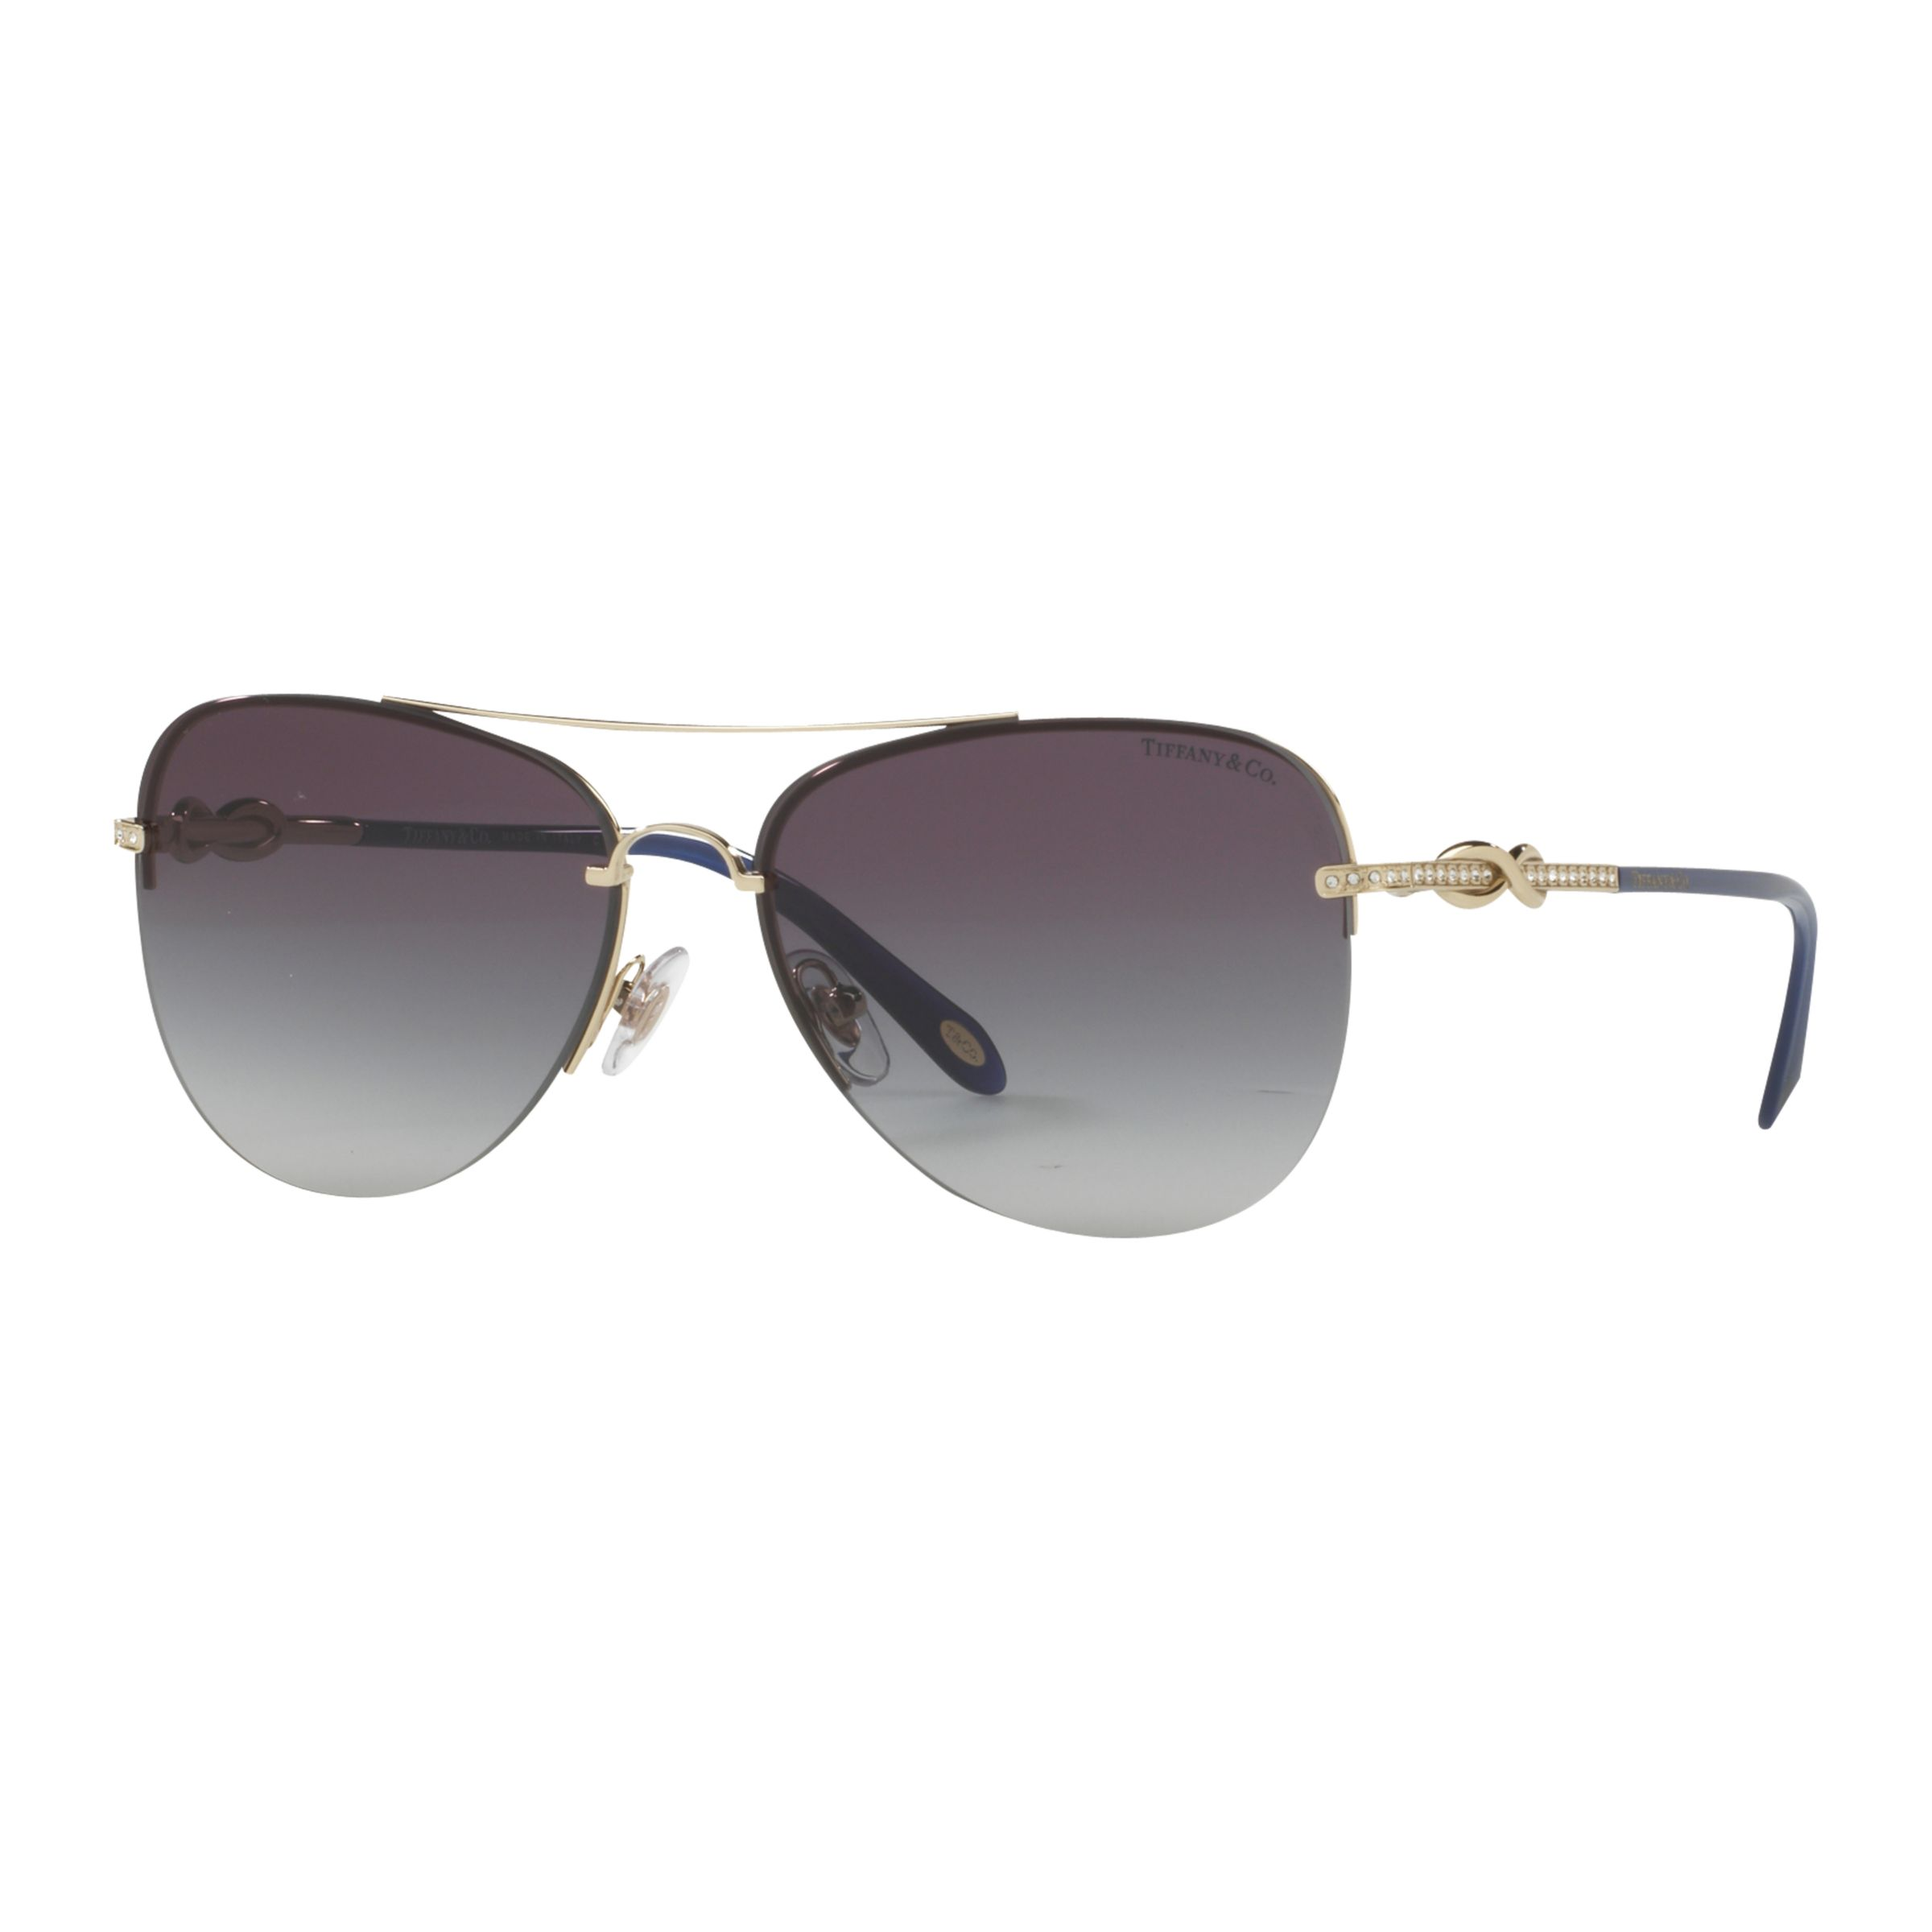 Tiffany & Co Tiffany & Co TF3054B Embellished Aviator Sunglasses